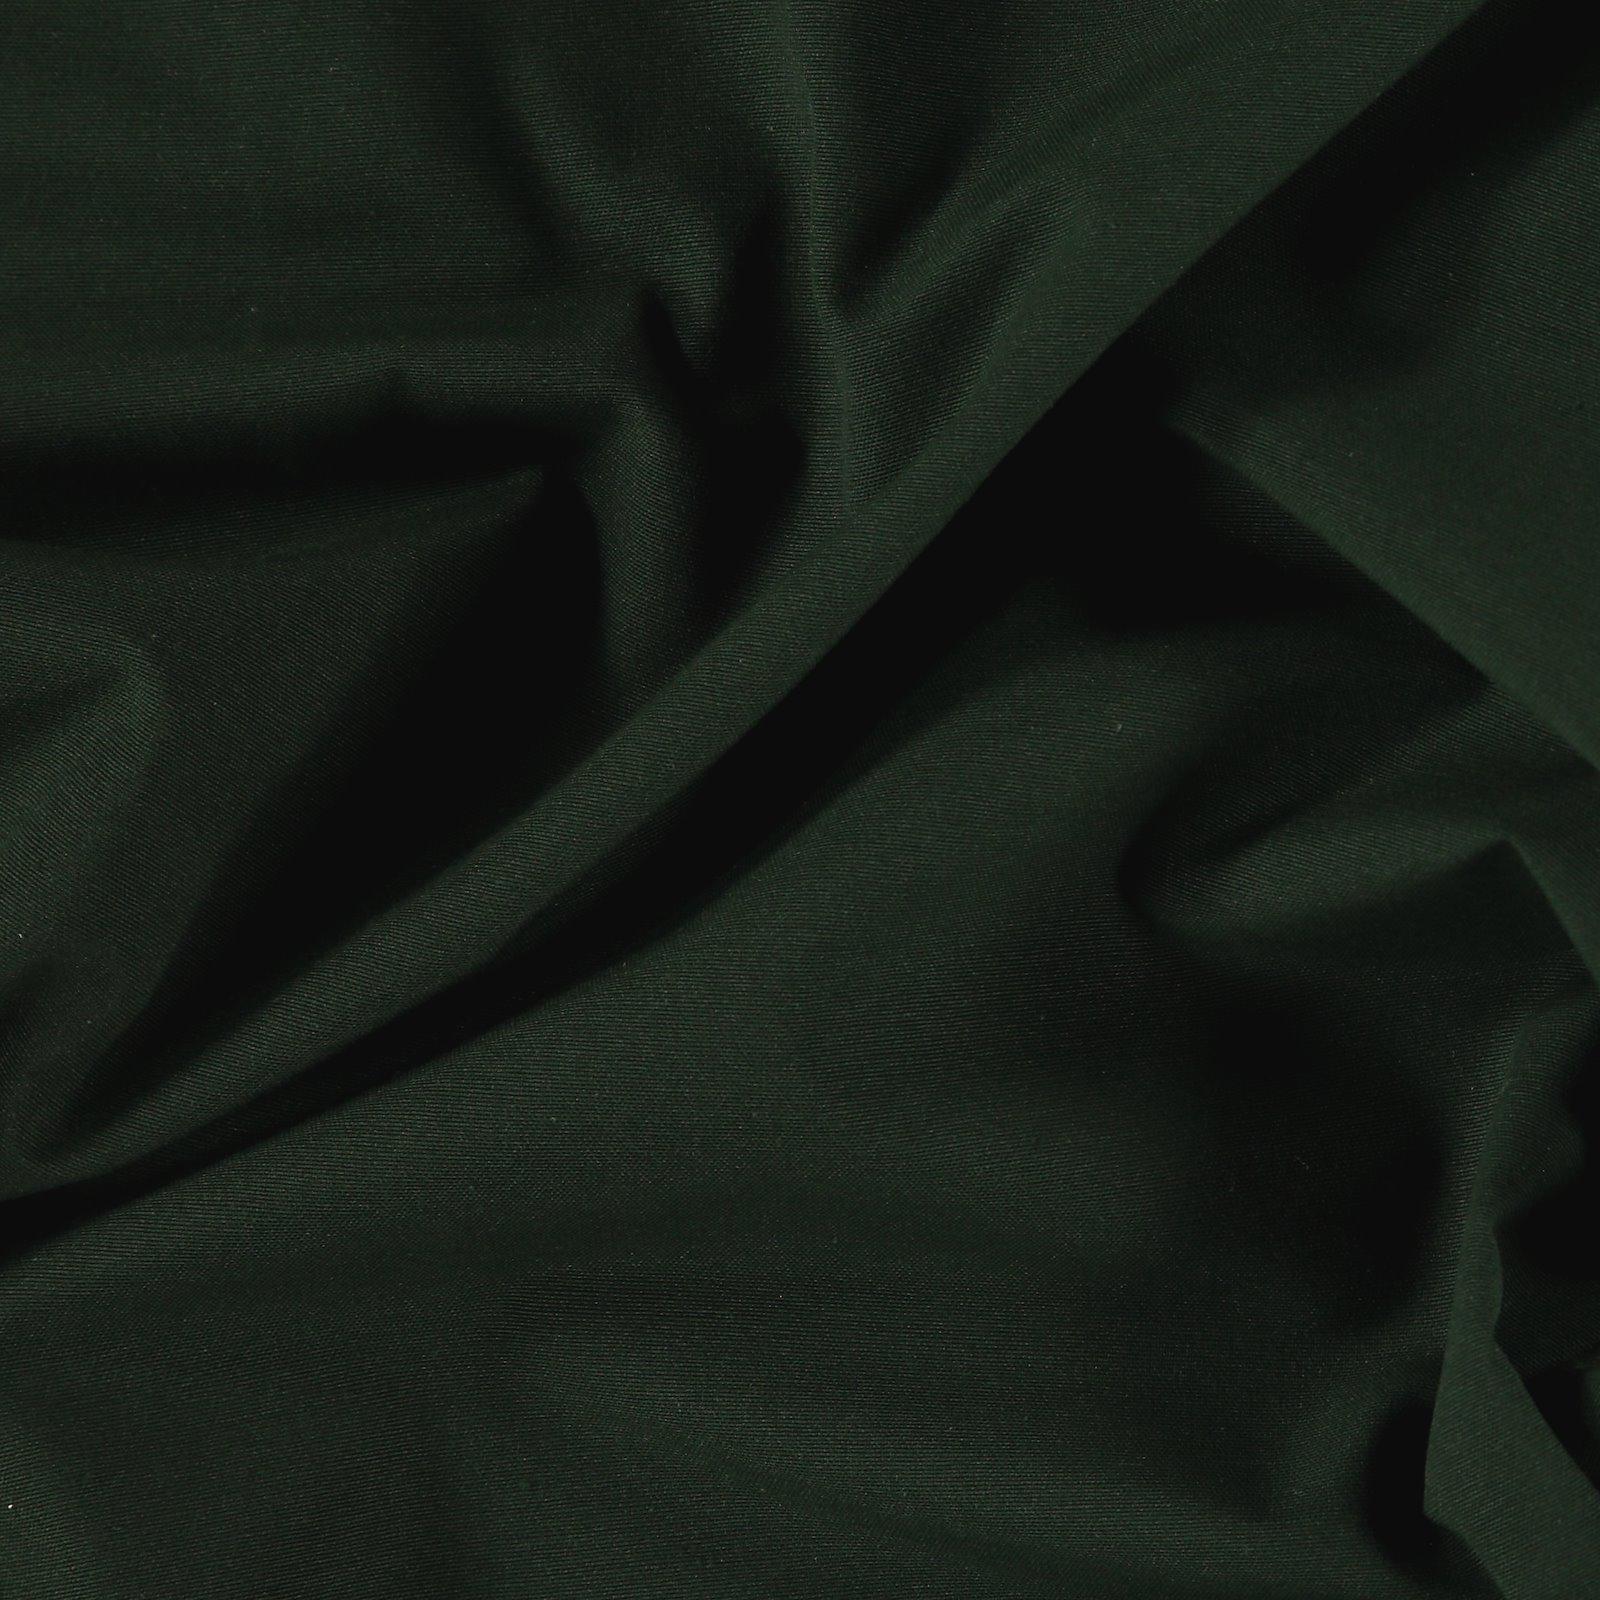 Yarn dyed dark bottle green